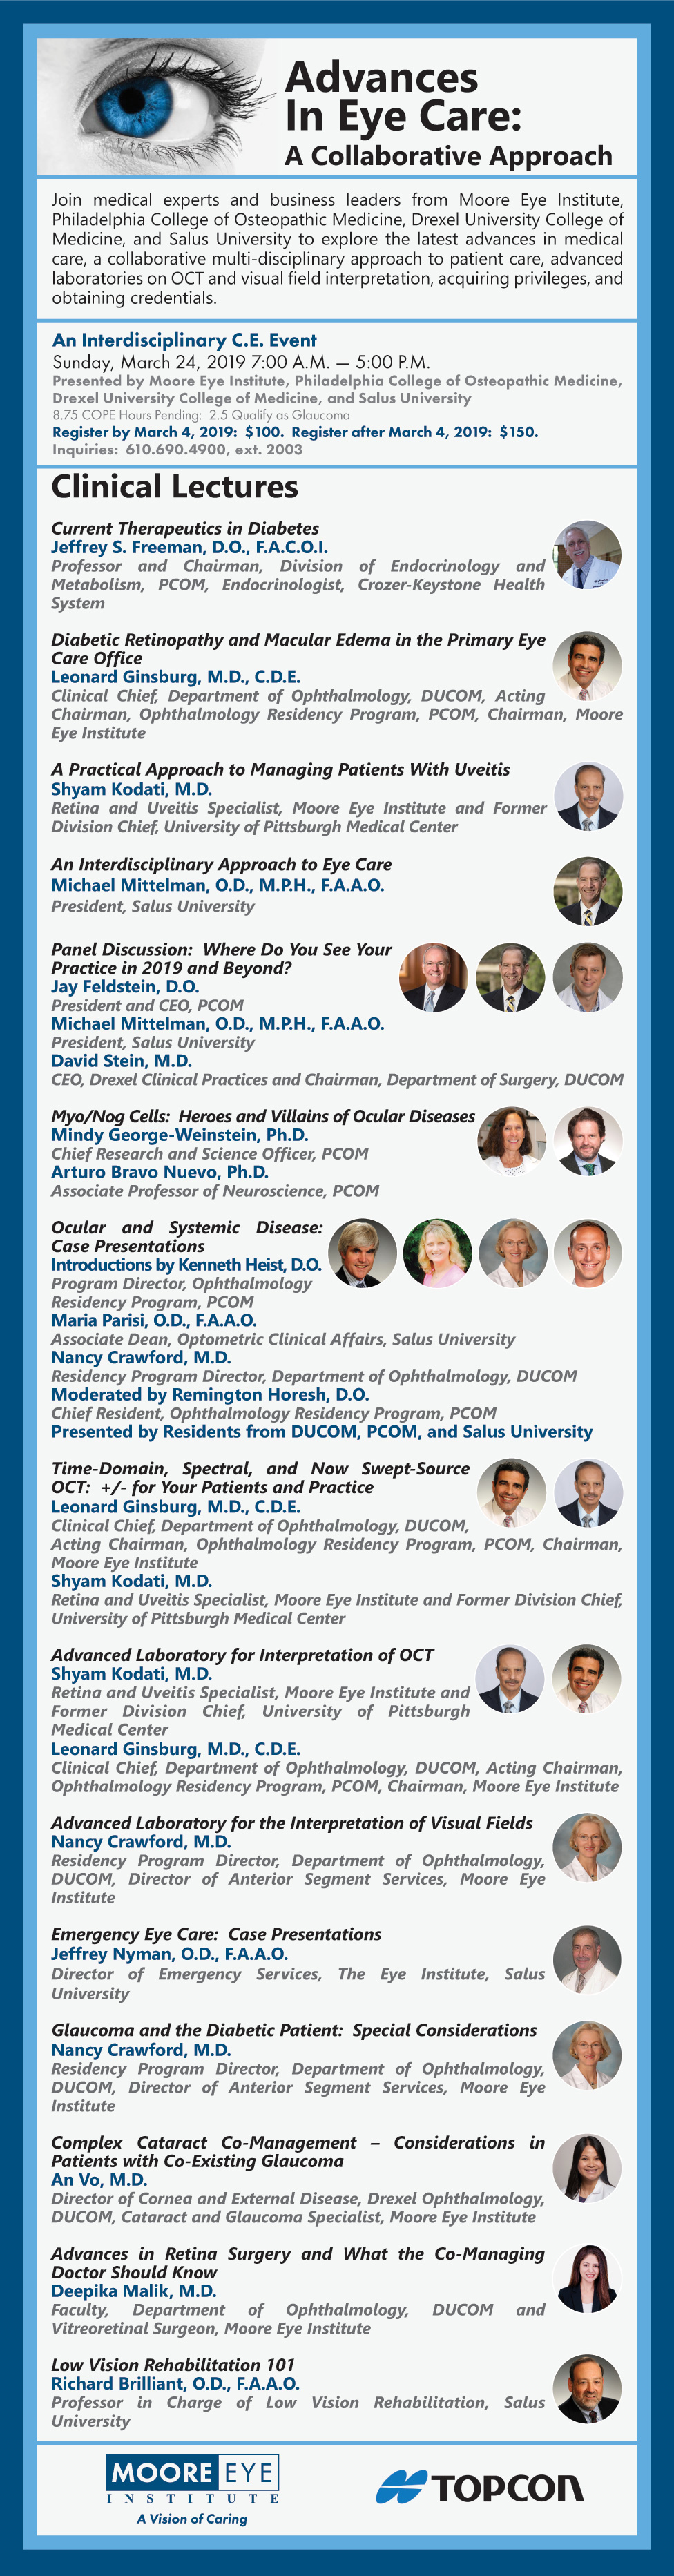 Advances in Eye Care Program